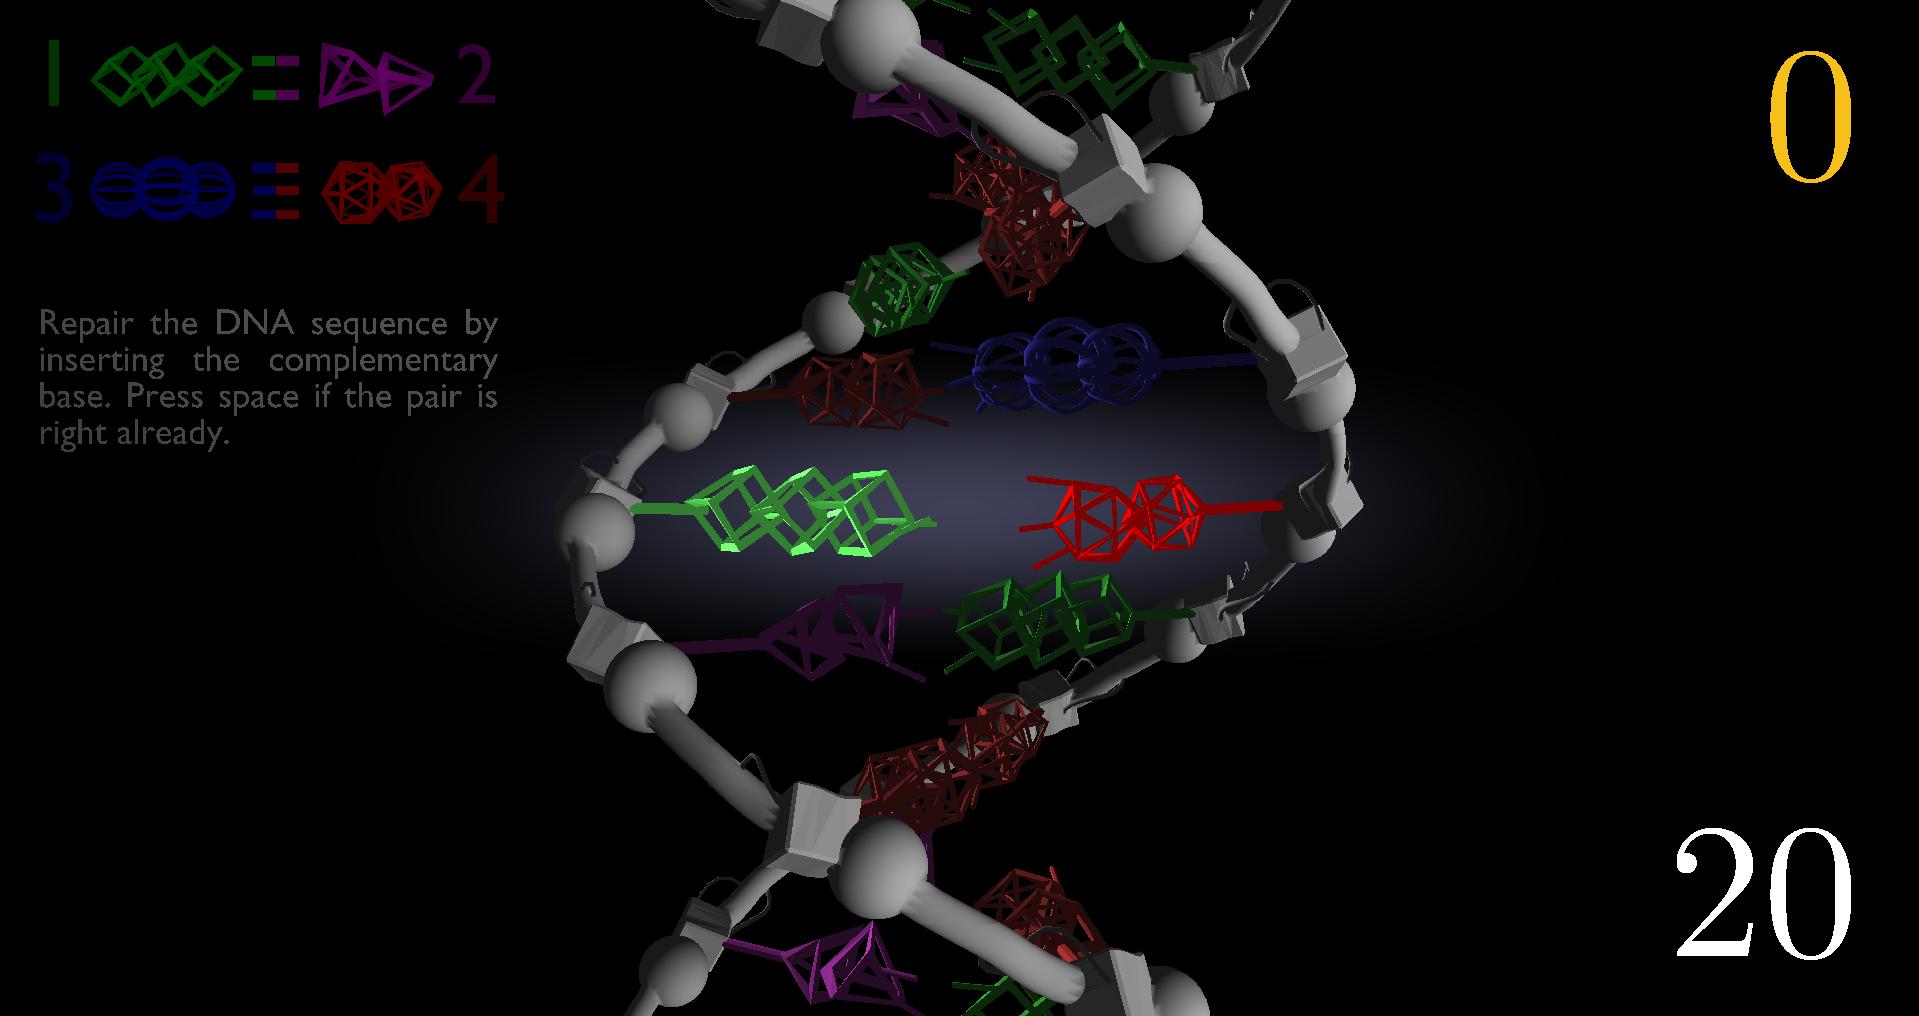 game screenshot: DNA